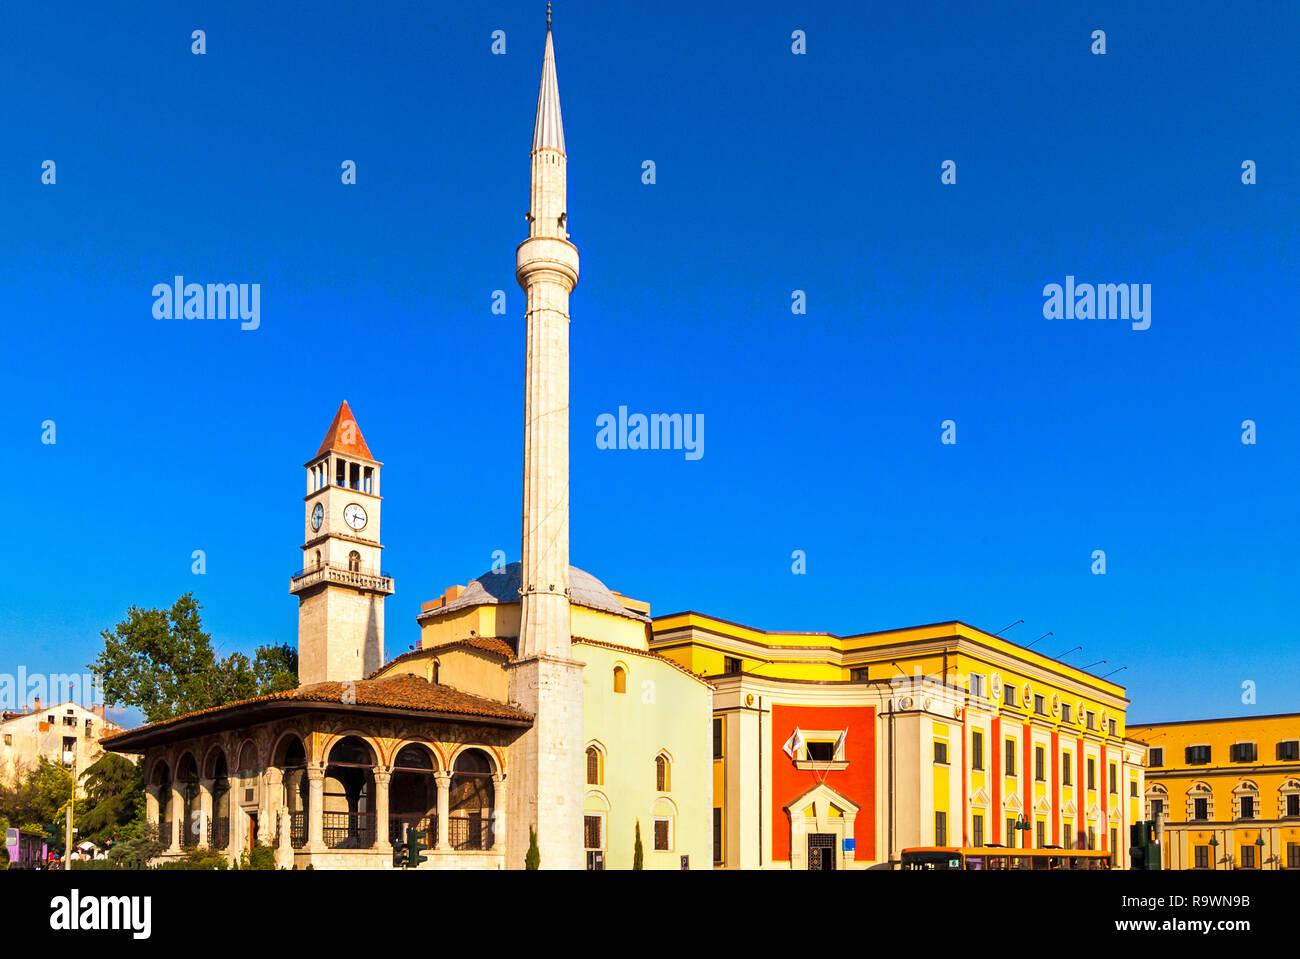 Ethem Bay mosque and Clock Tower, Skanderberg Square, Tirana, Albania - Stock Image